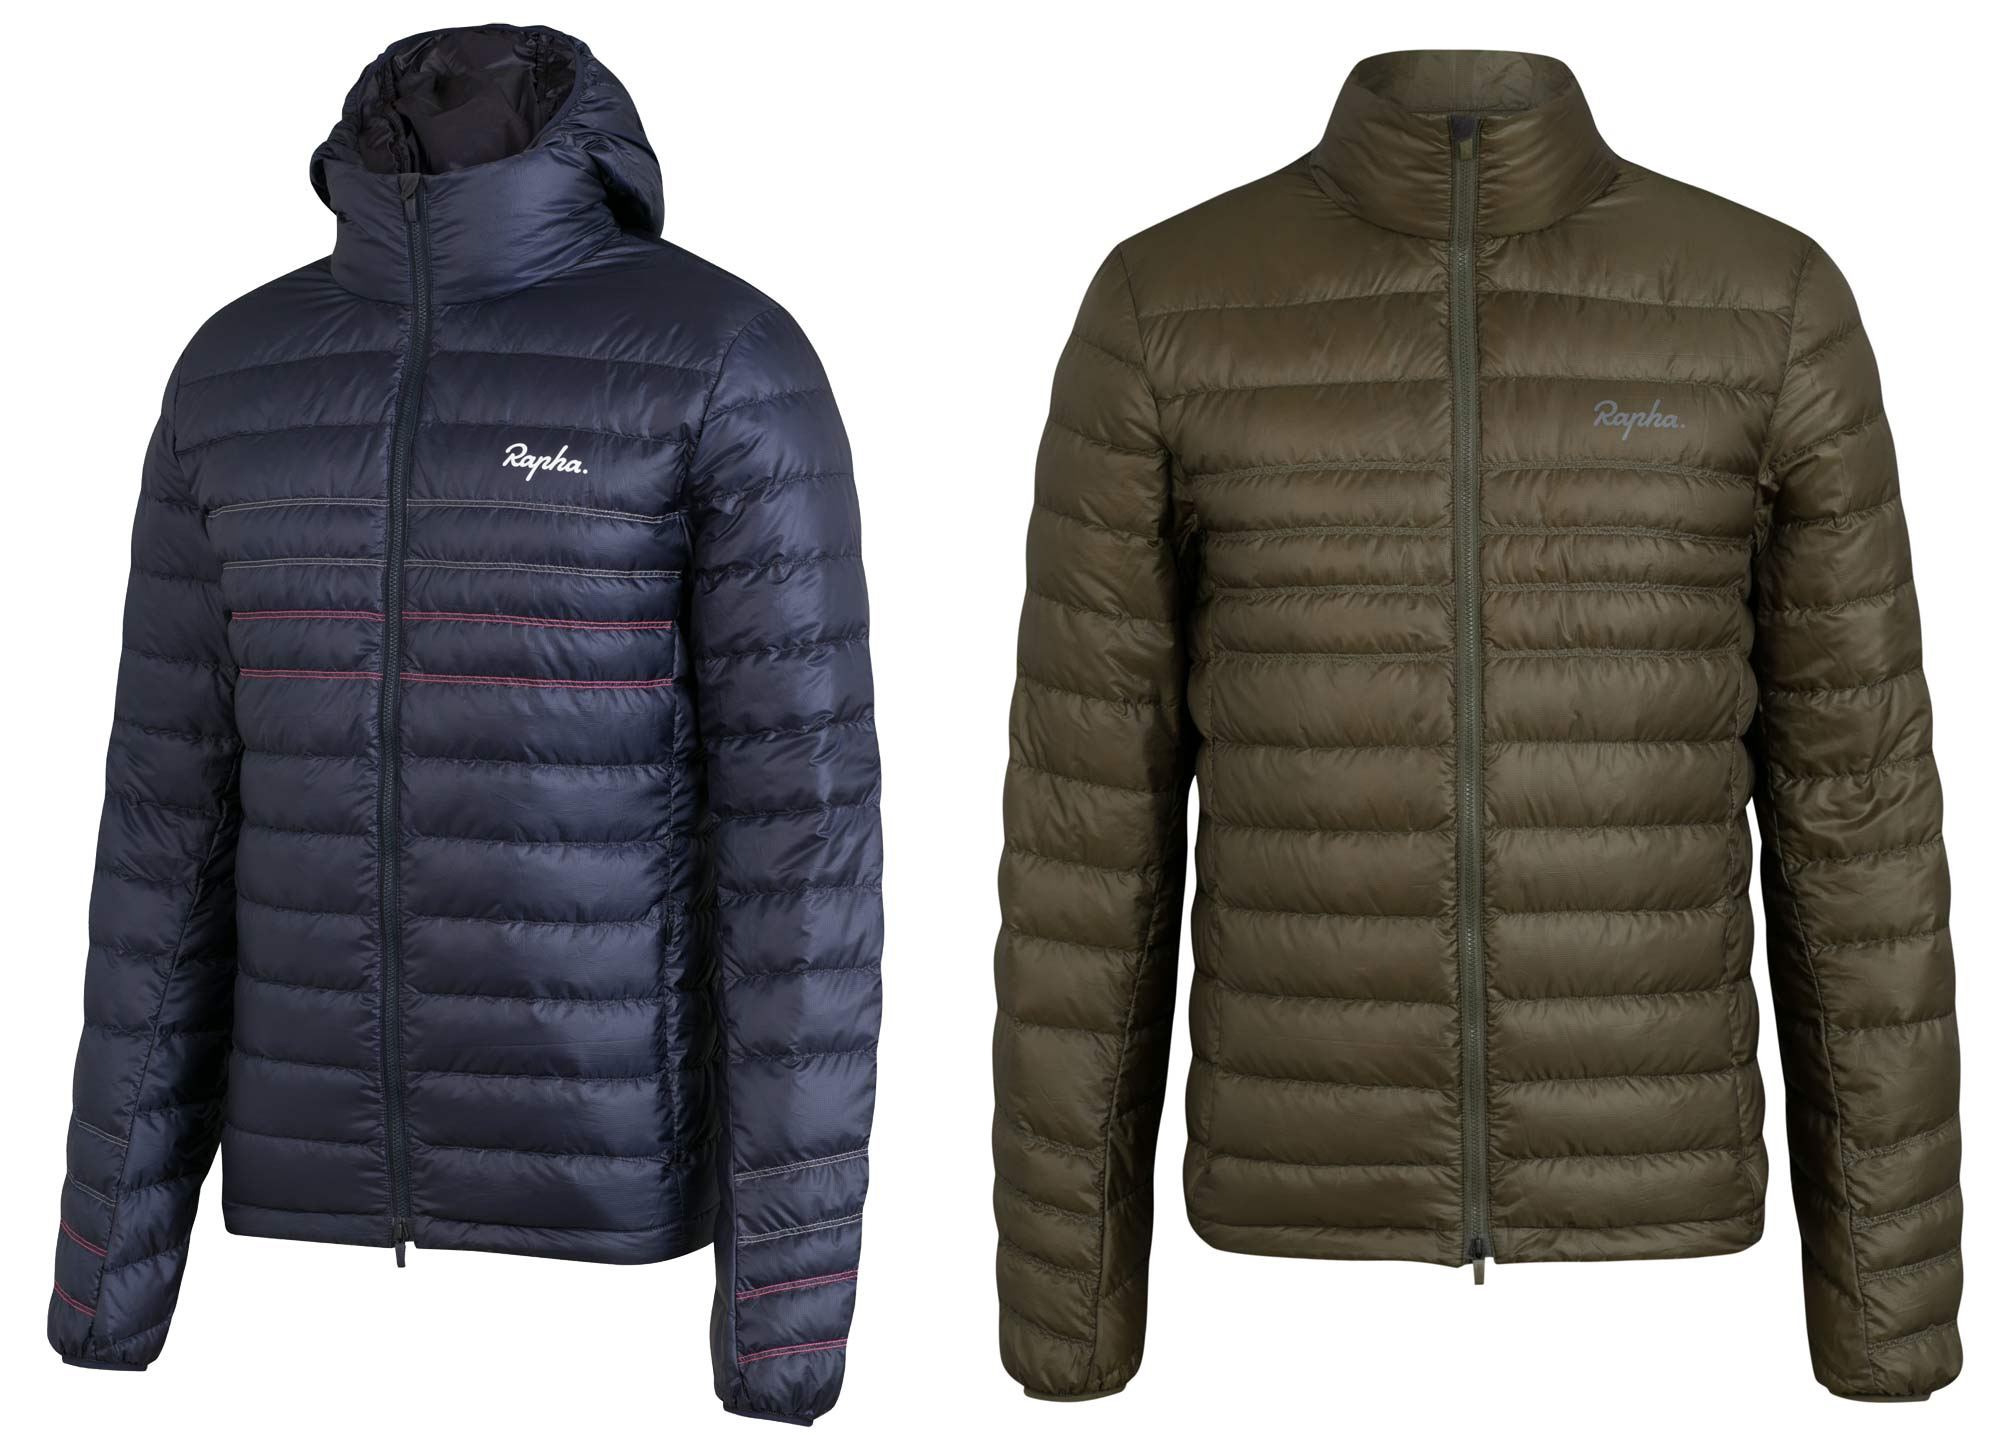 Rapha Explore Sleep System - Explore Down Jacket + Explore Down Sleeping  Bag for bikepacking 935782174